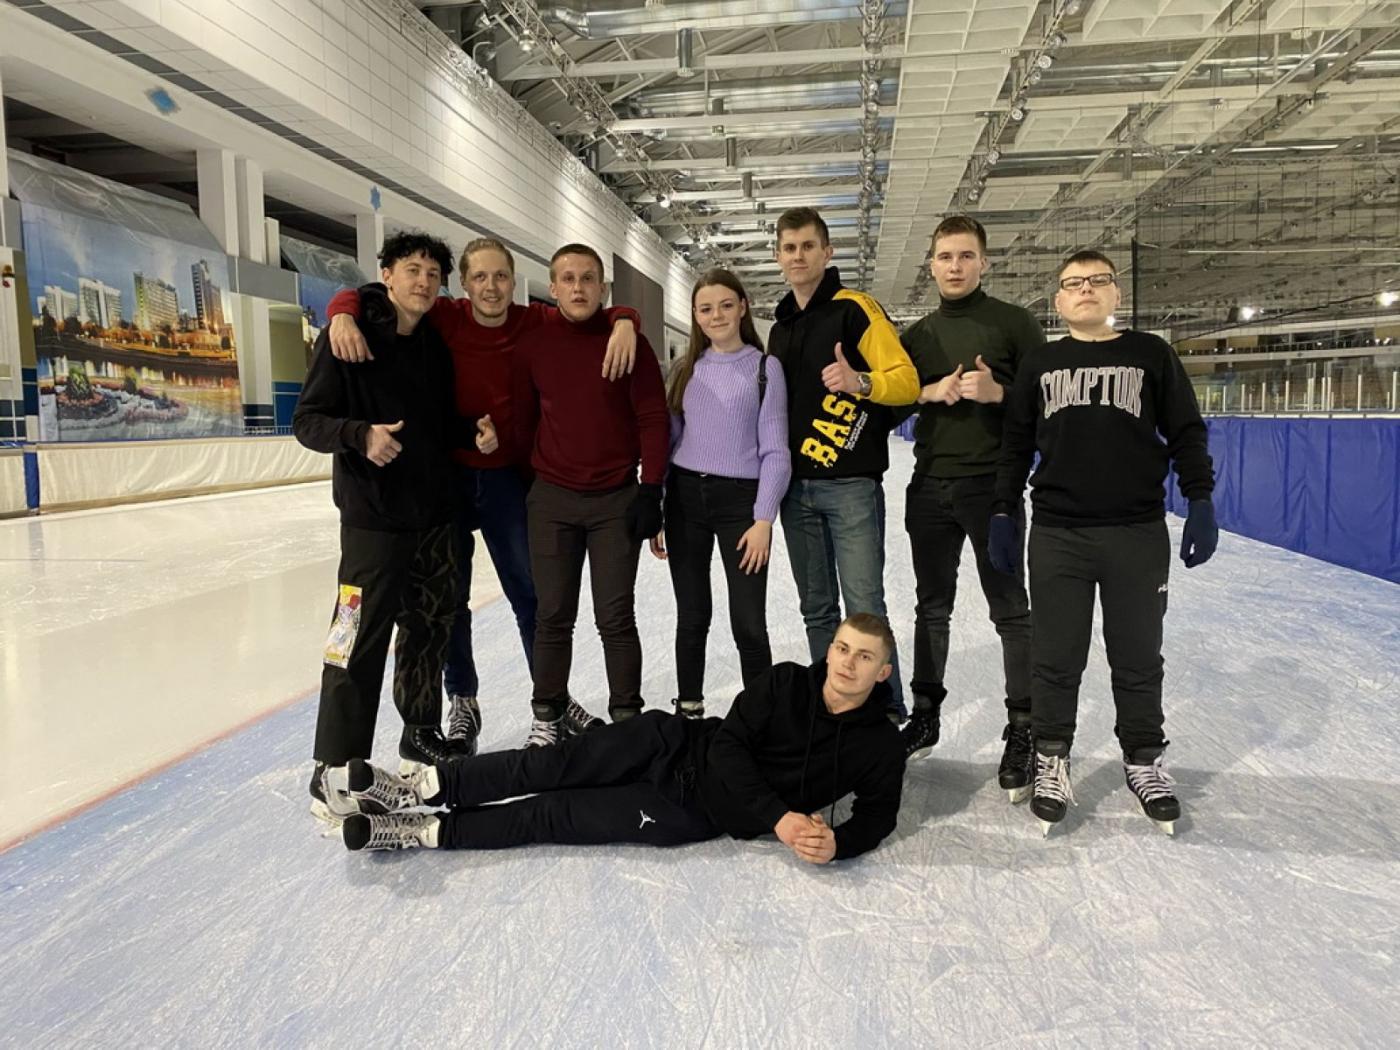 Все на лёд! Студенты МТФ посетили каток в Минск-Арене